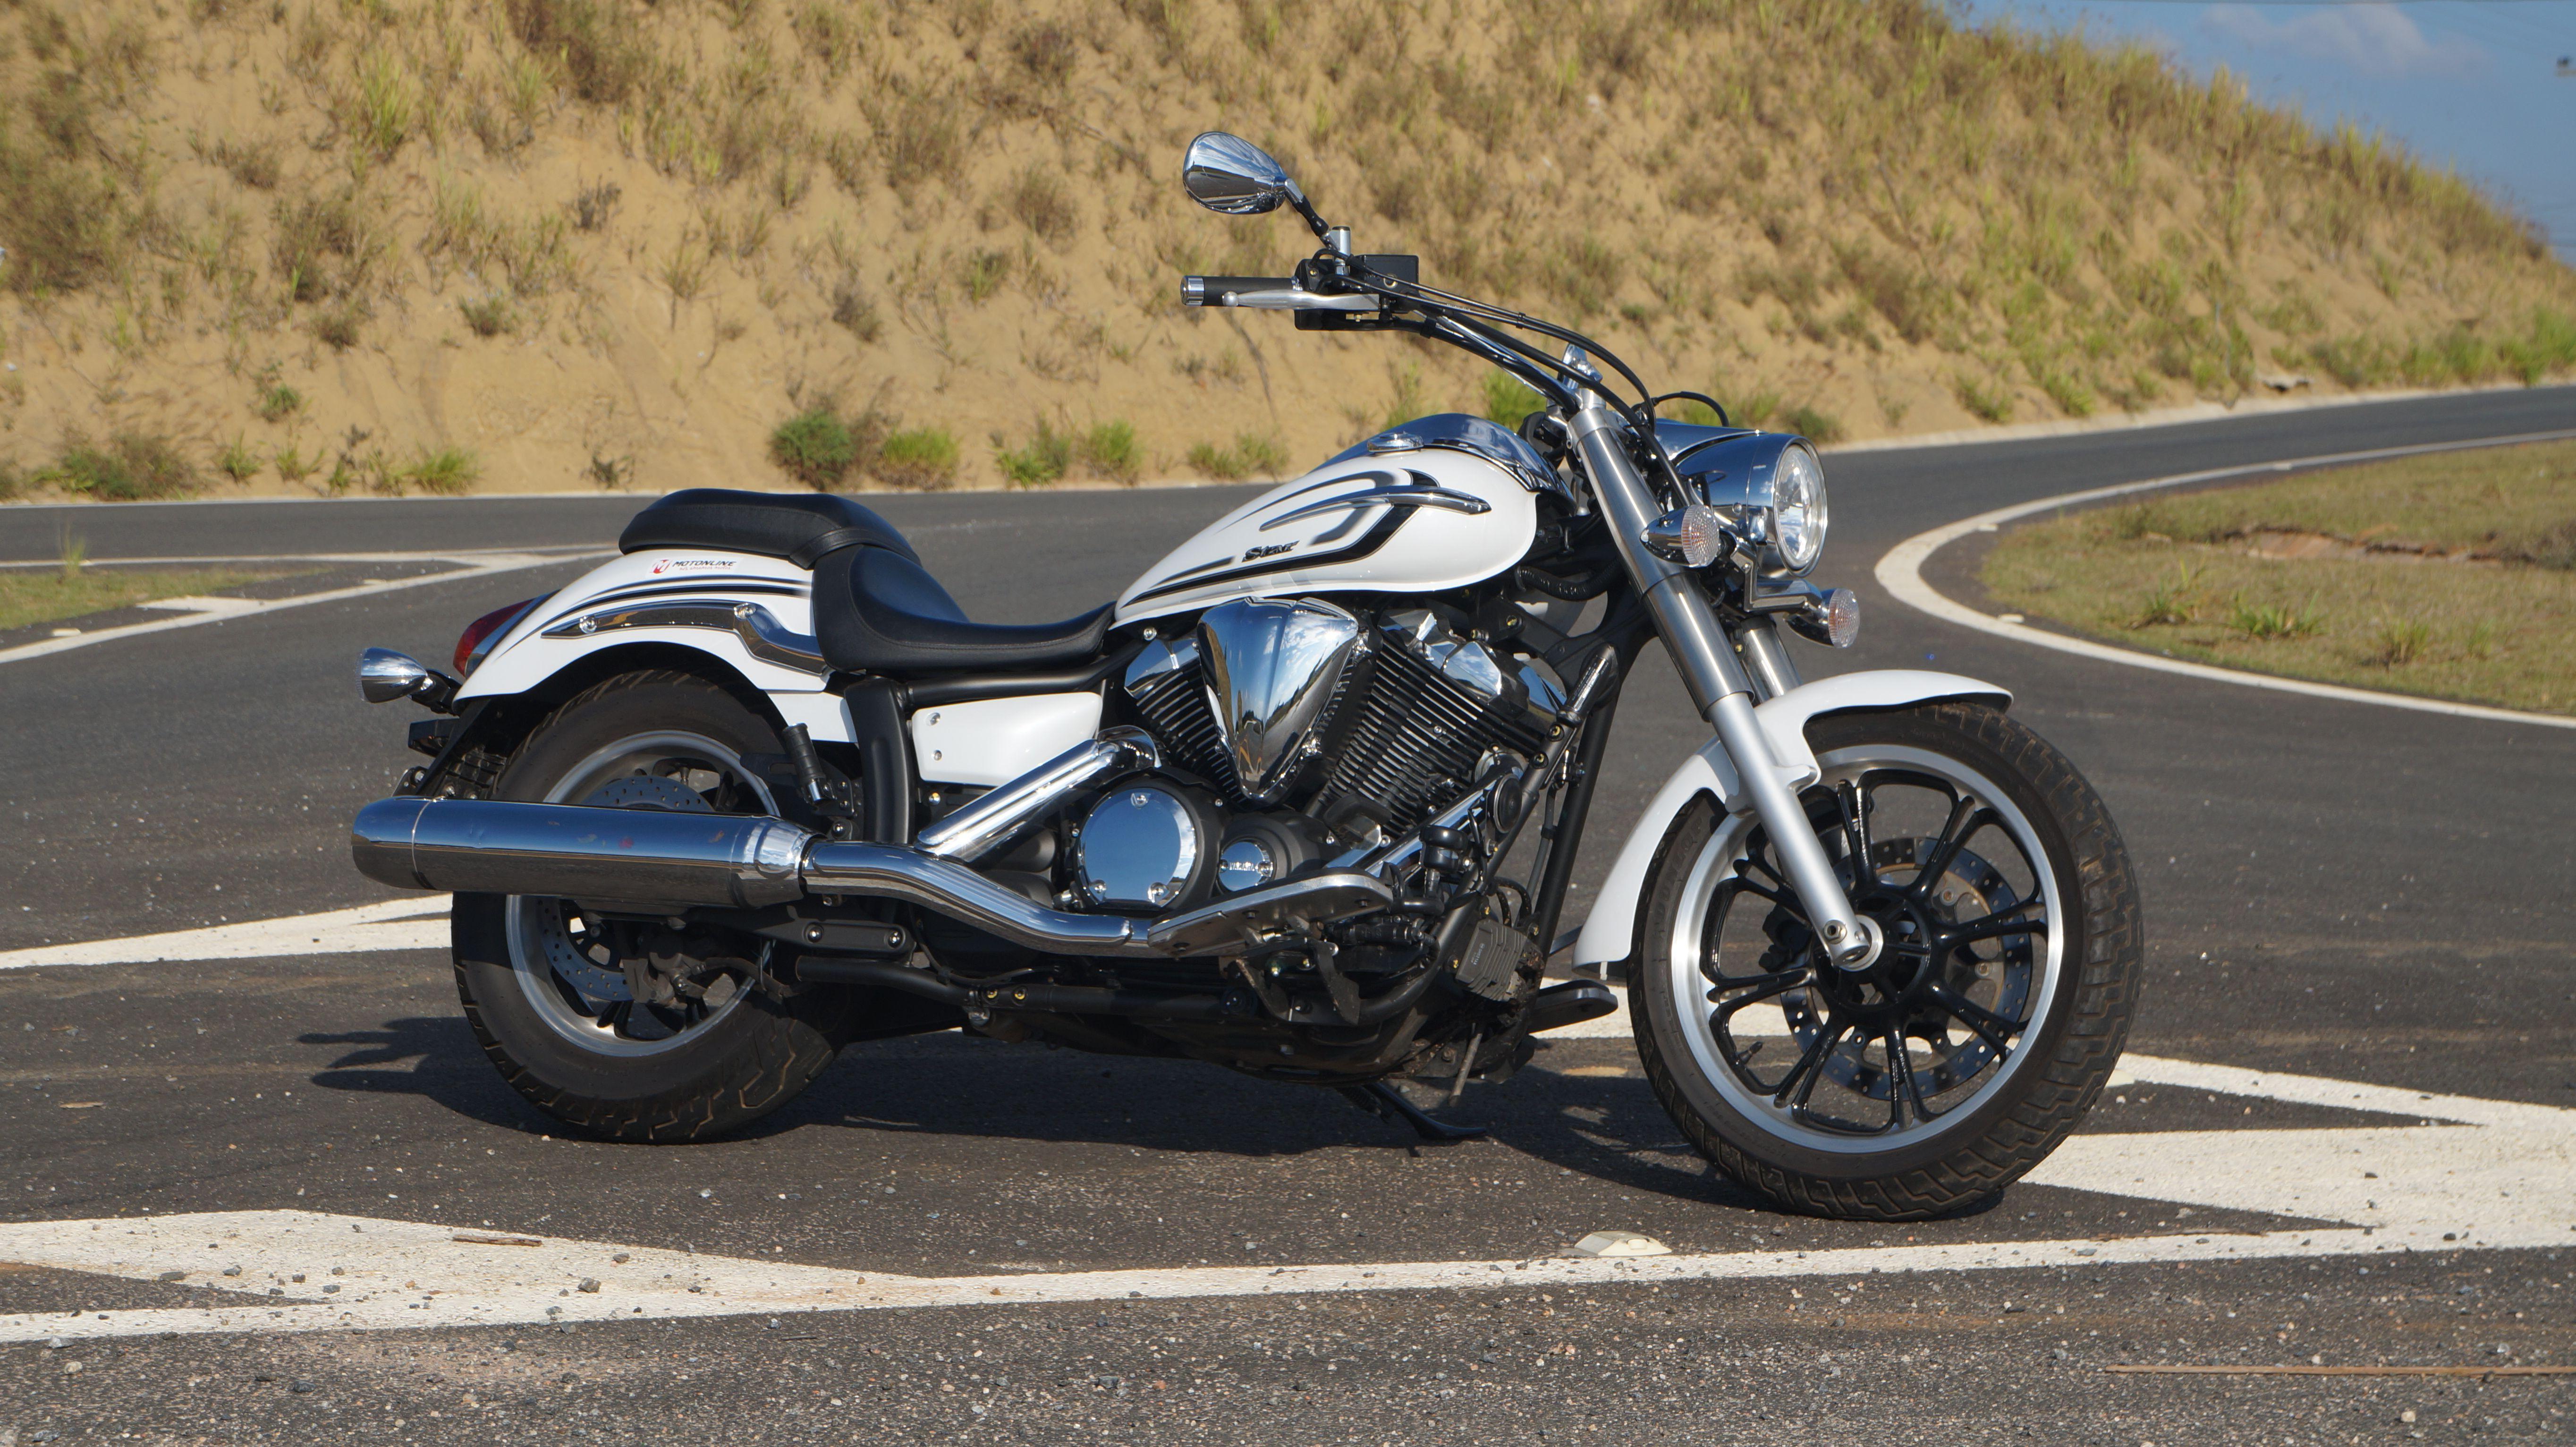 Yamaha XVS950A Midnight Star - Desde 2009 está entre nós